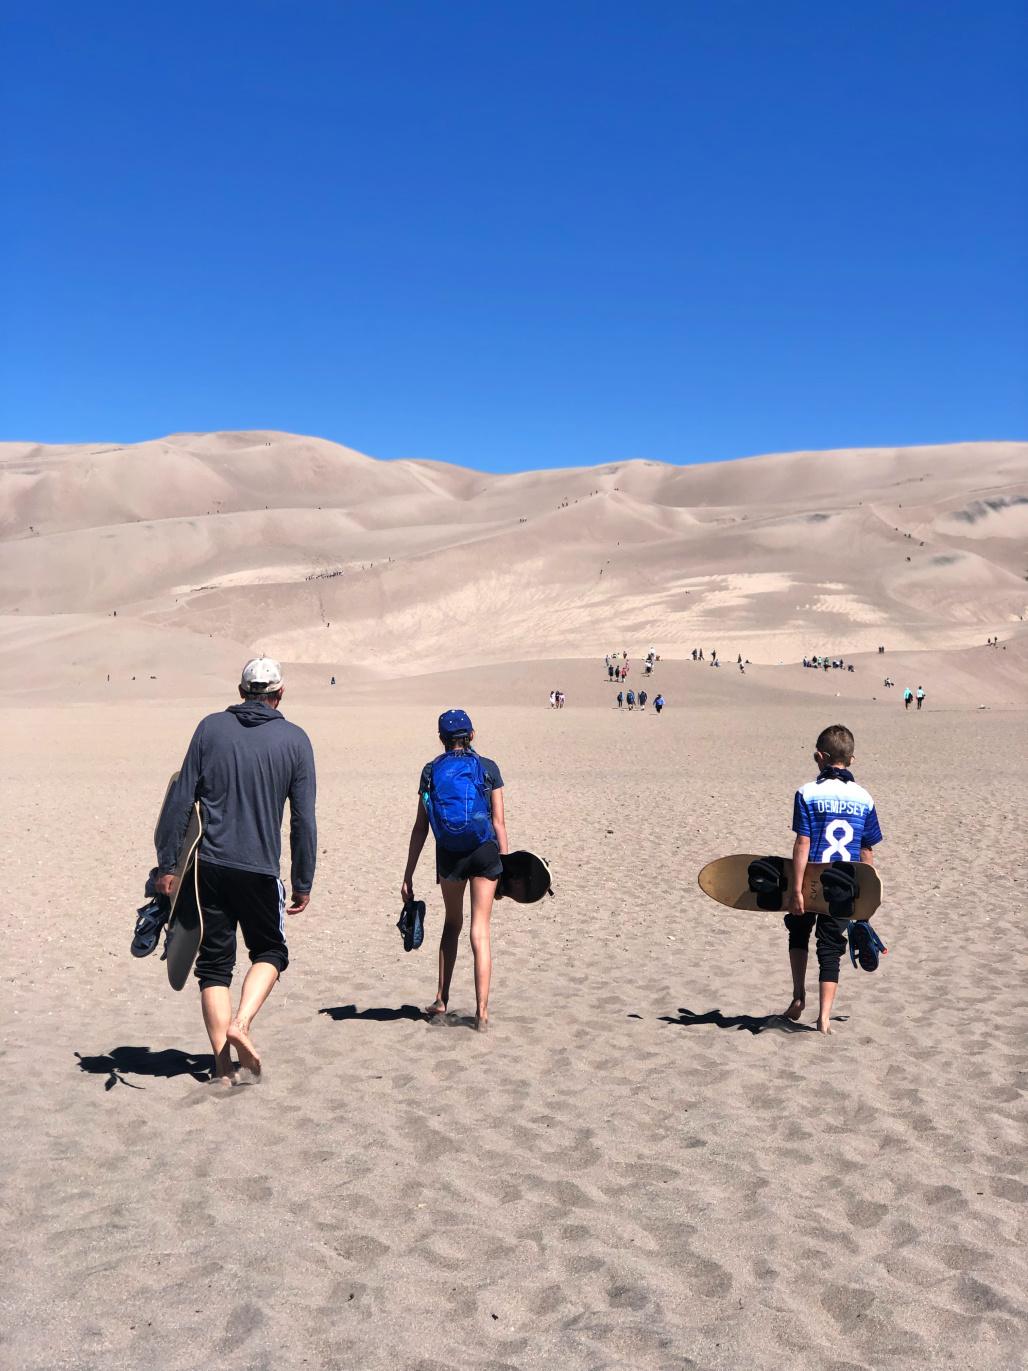 sledding-great-sand-dunes-national-park